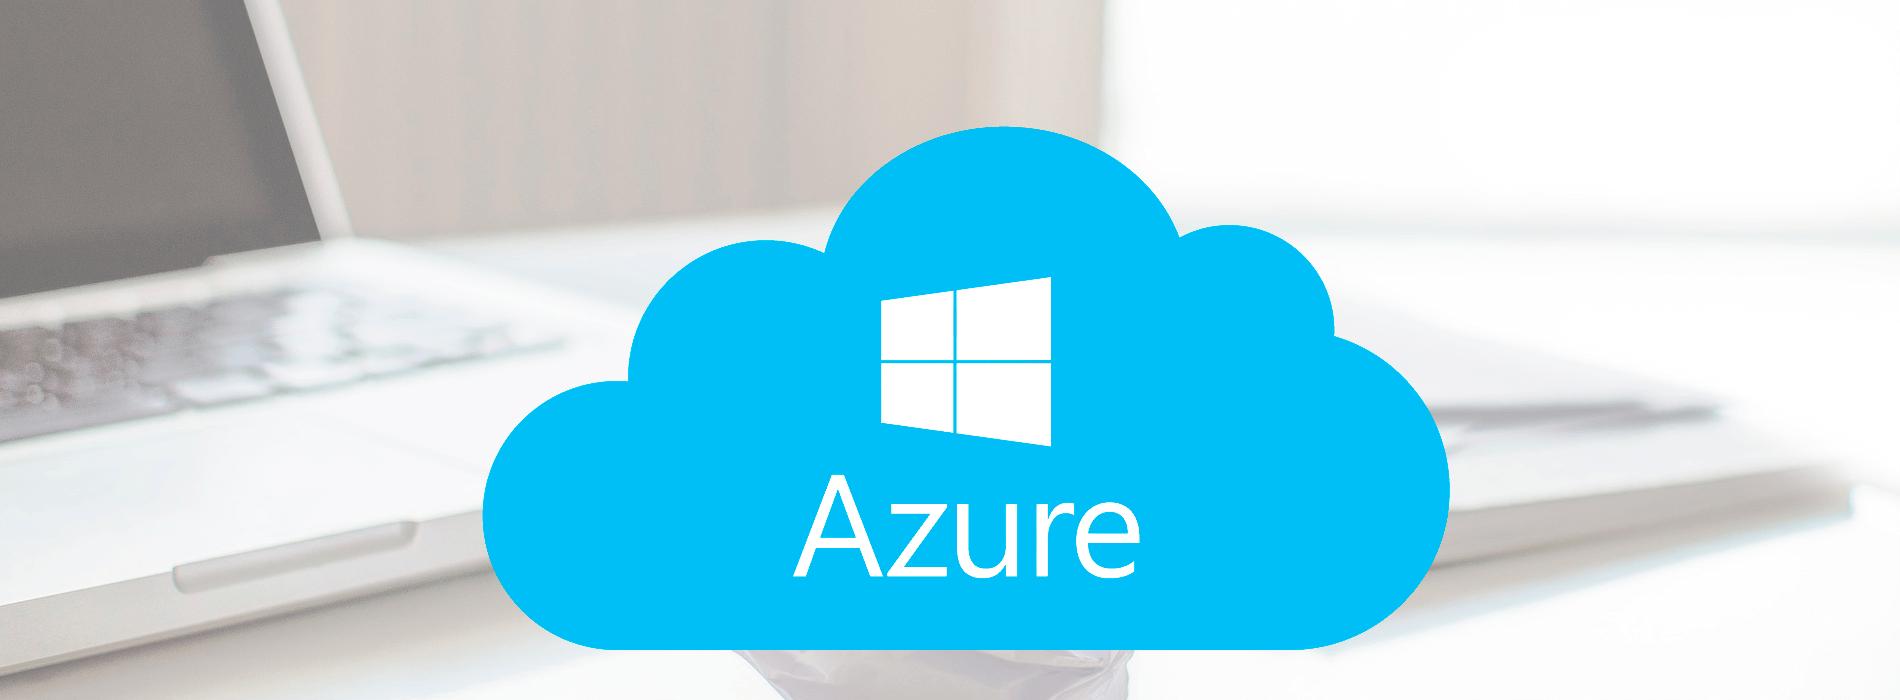 Microsoft AZURE - Suite cloud computing de Microsoft